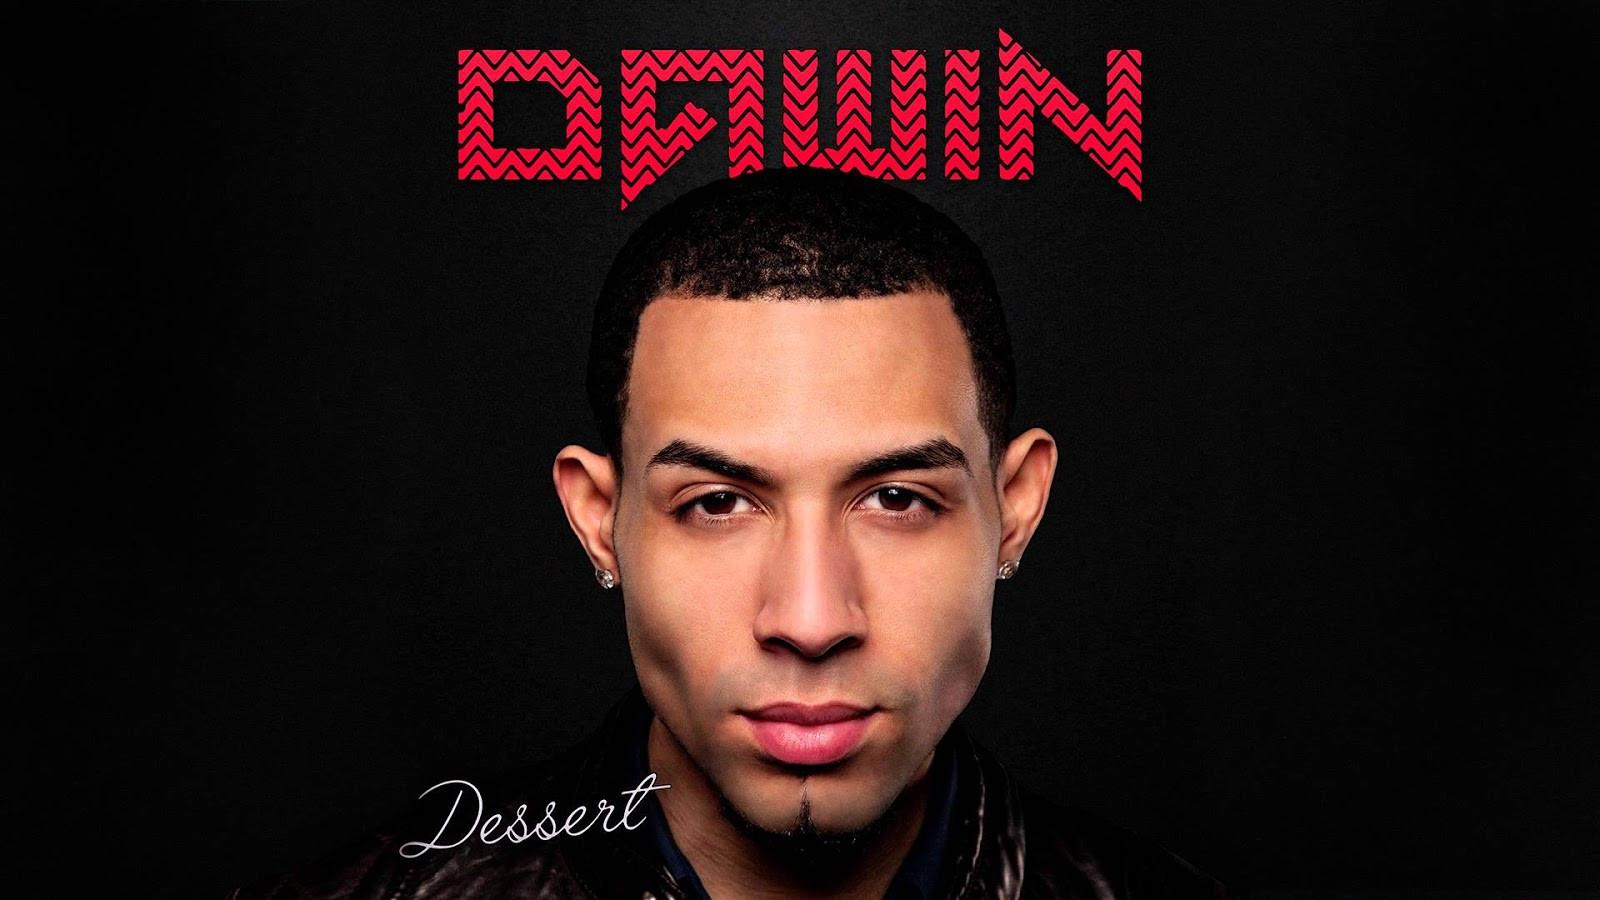 Dessert Darwin Mp3  Download Dawin Feat Silento Dessert Mp3 Hyper Download